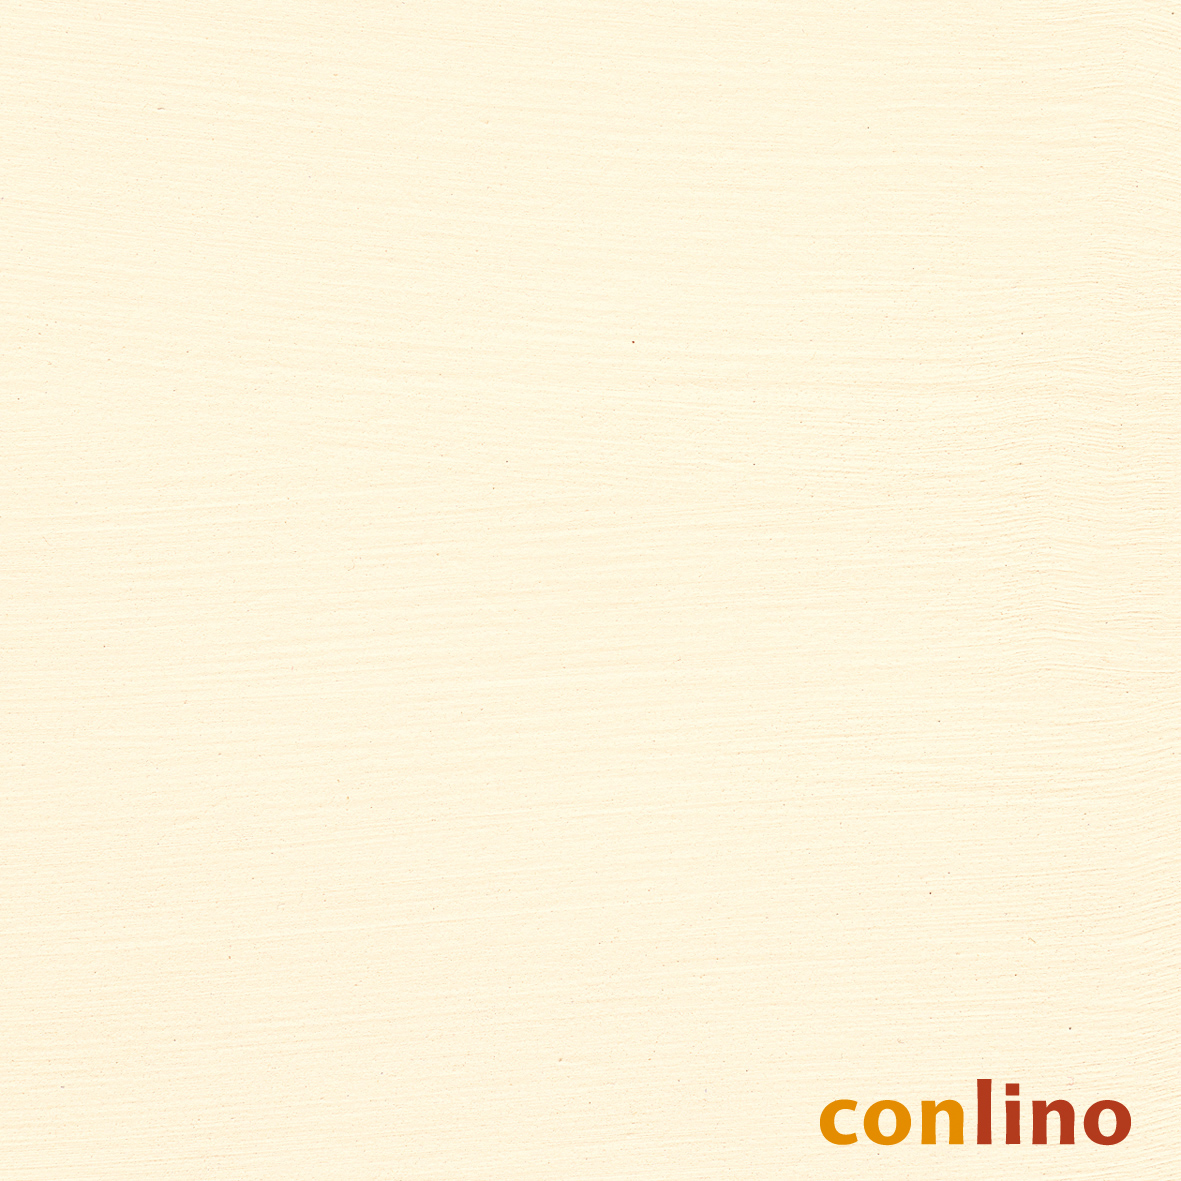 conlino Lehmfarbe Cyperngelb hell CL 142